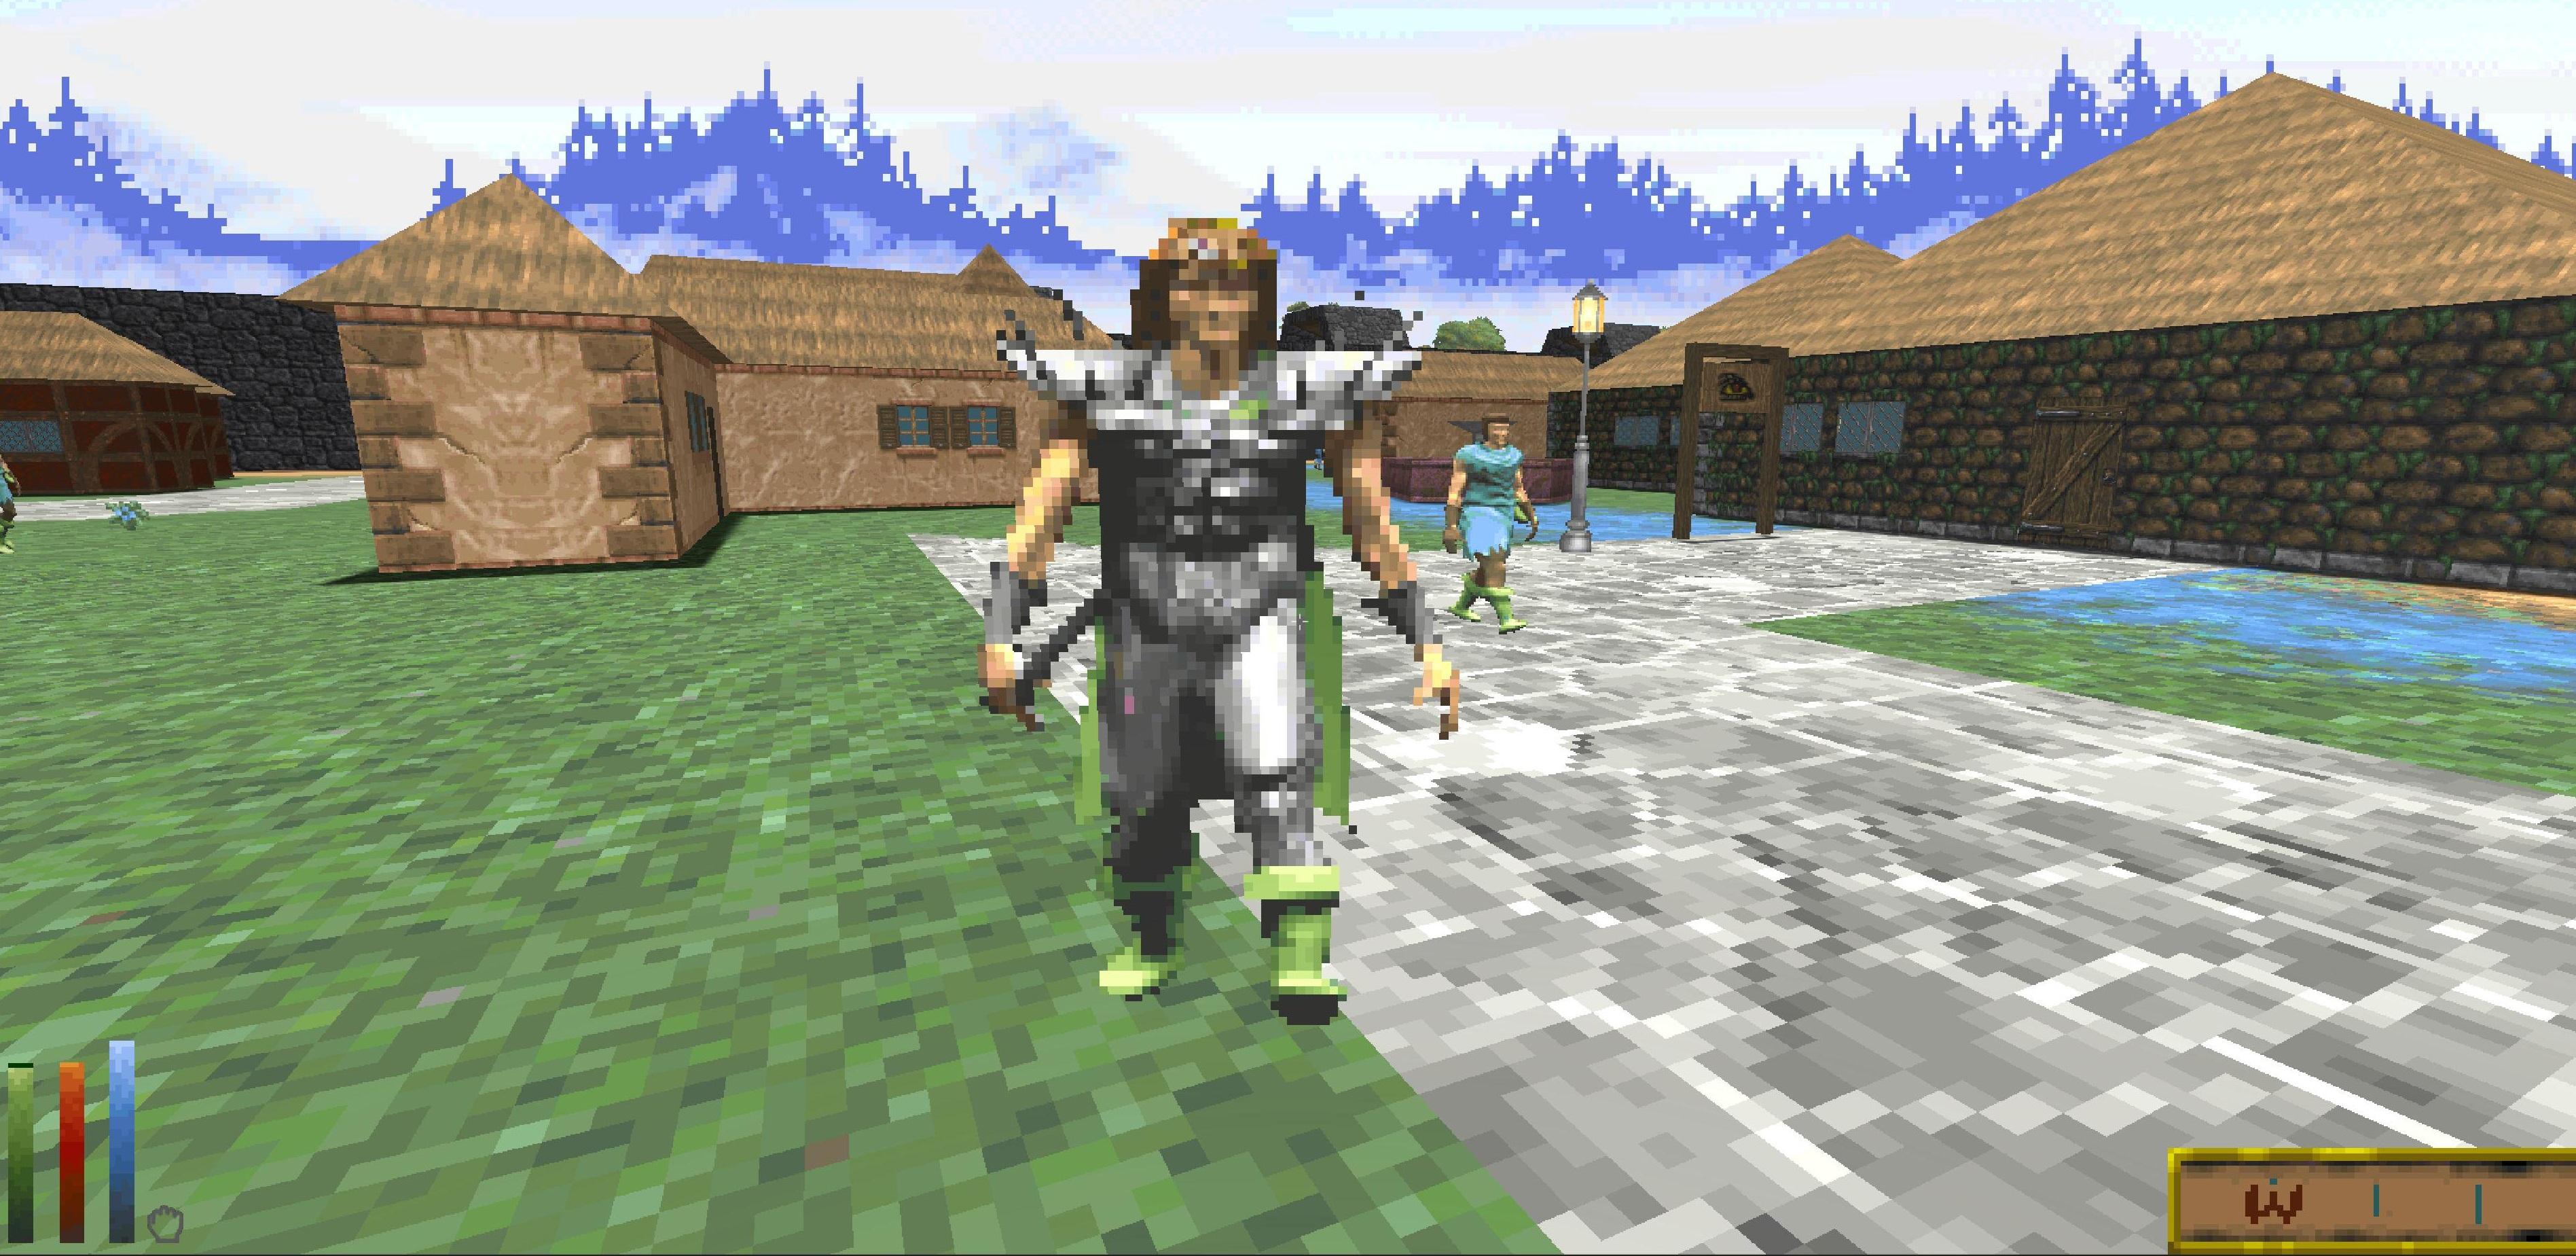 Daggerfall Unity remasters the classic Elder Scrolls | PC Gamer